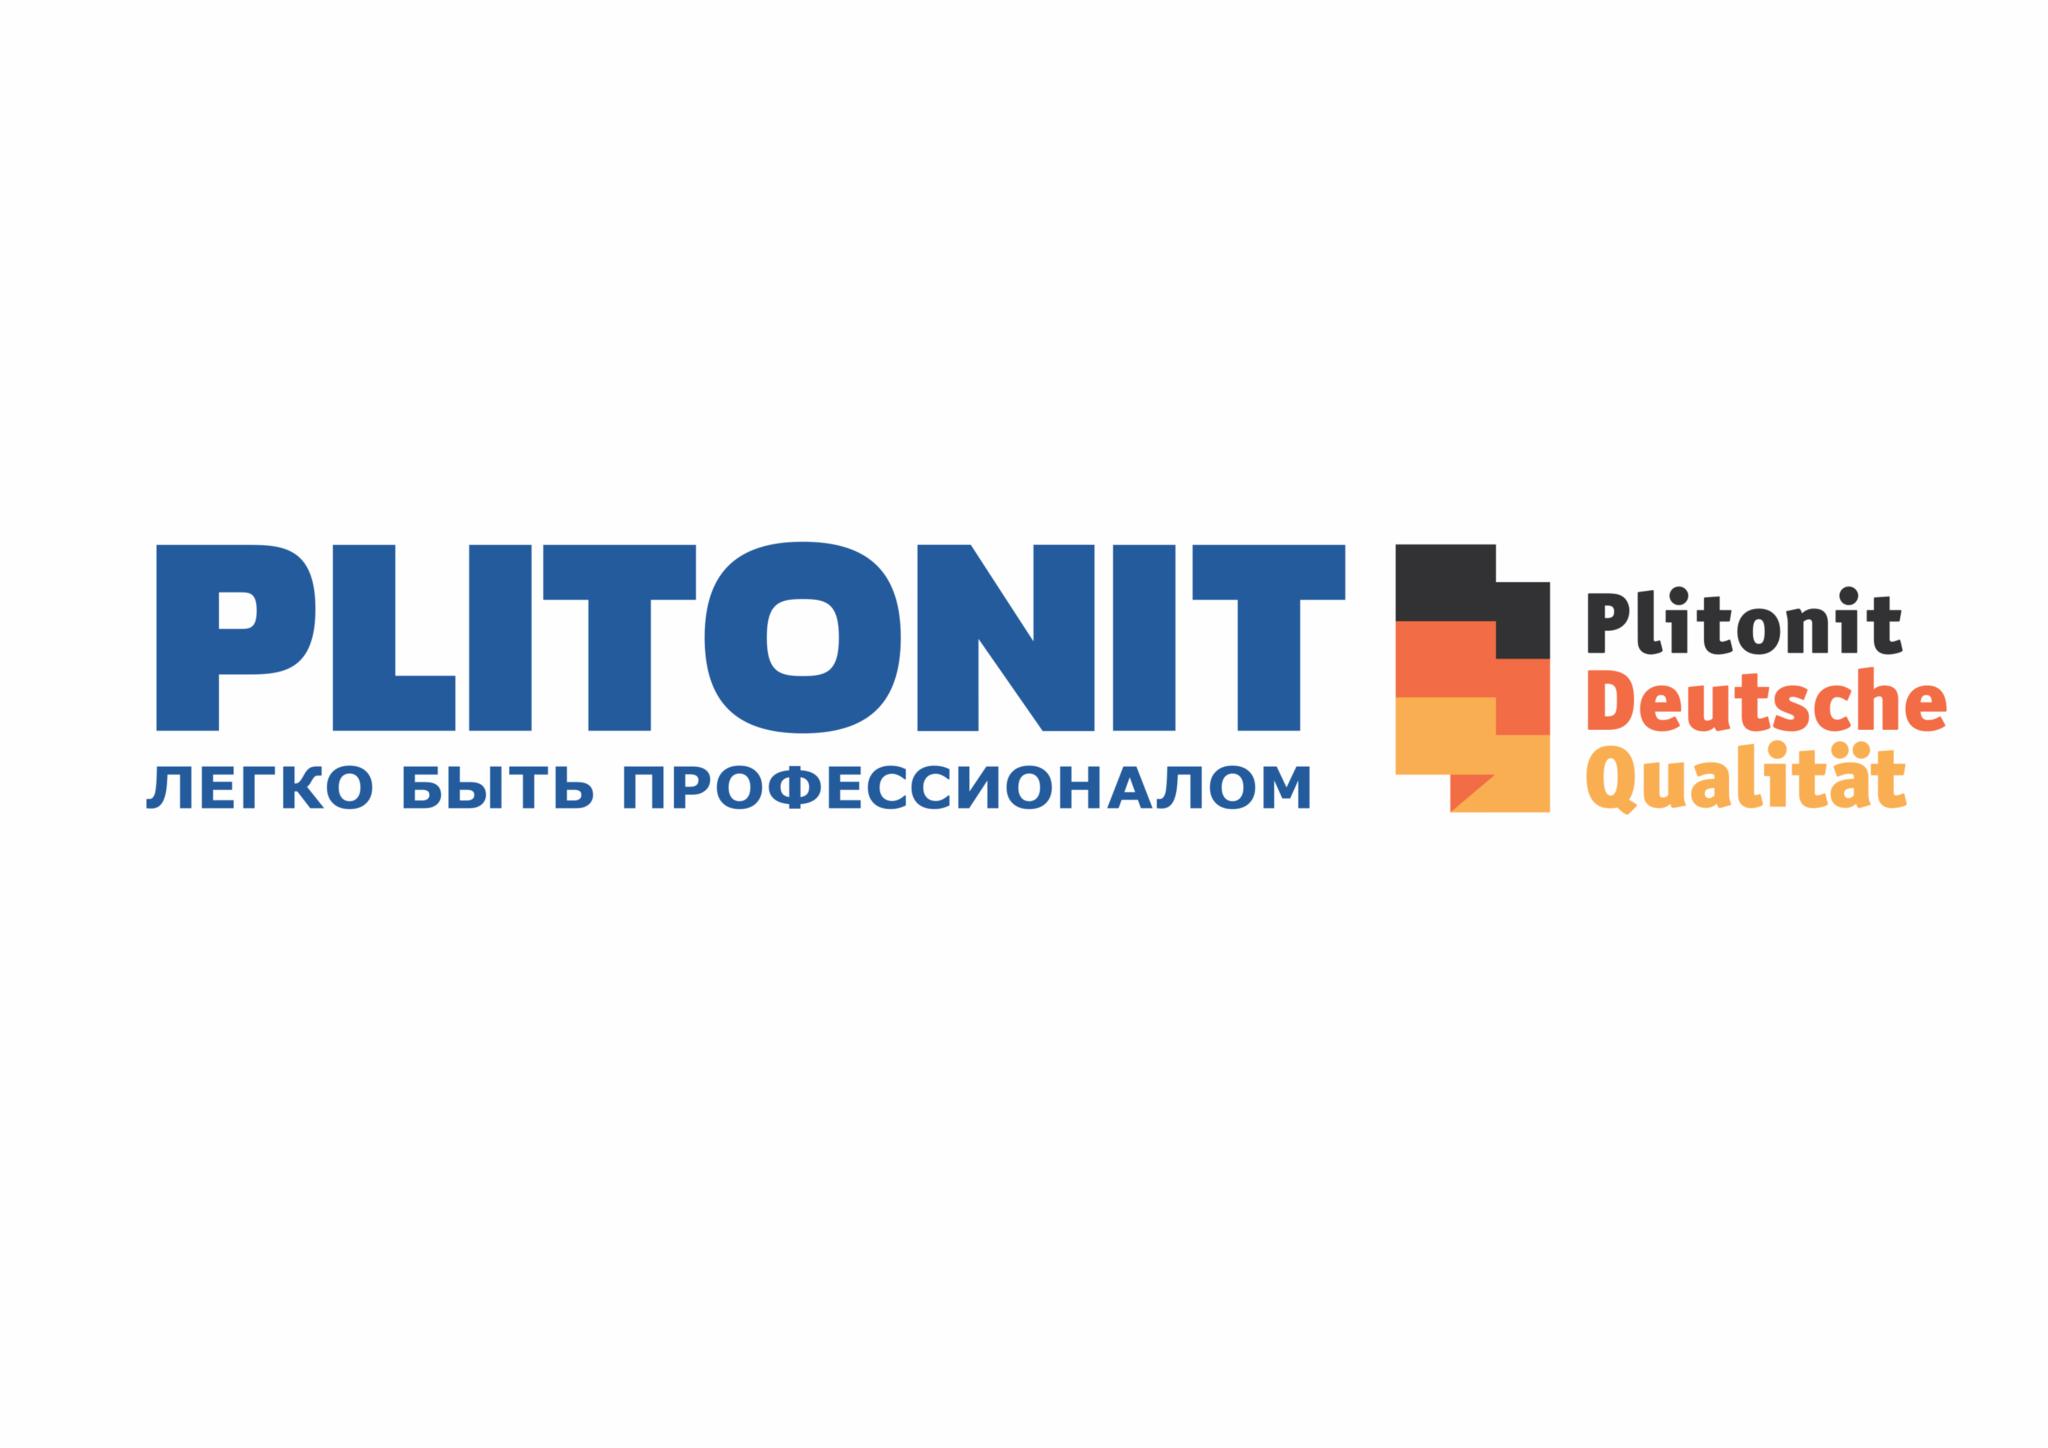 PLITONIT